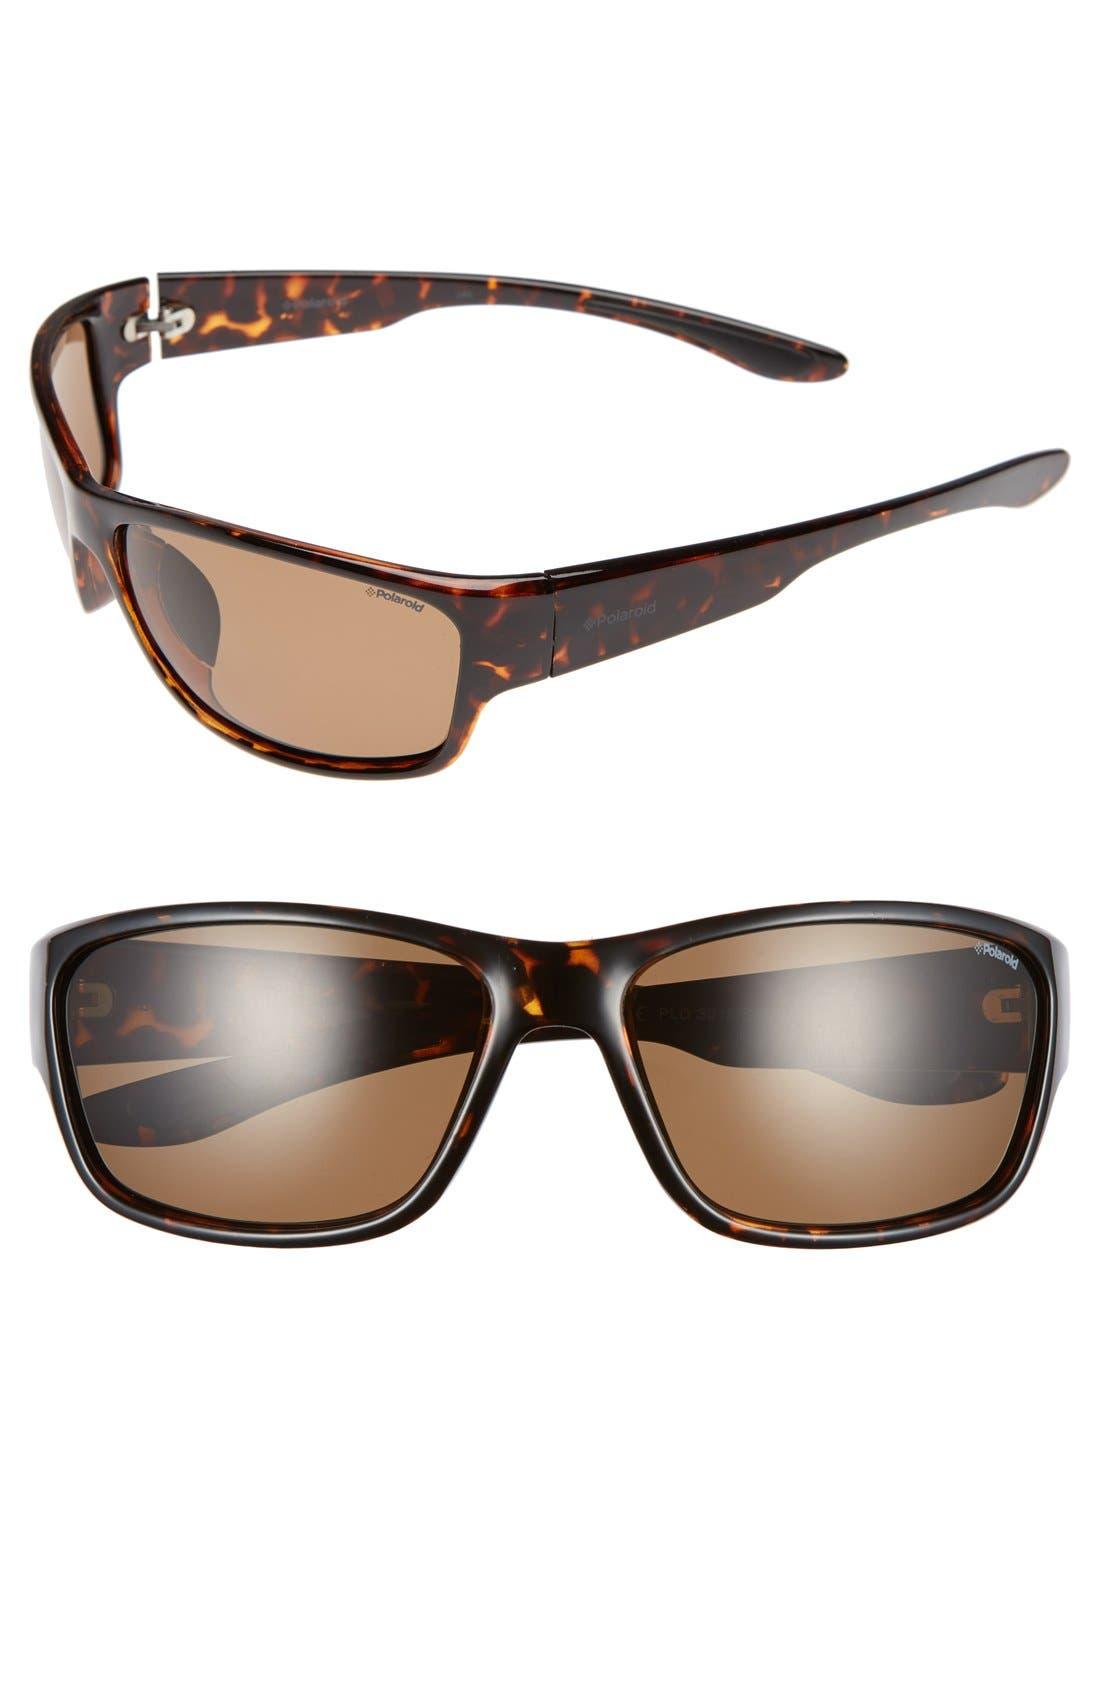 Polaroid 3015/S 63mm Polarized Sunglasses,                             Main thumbnail 1, color,                             210